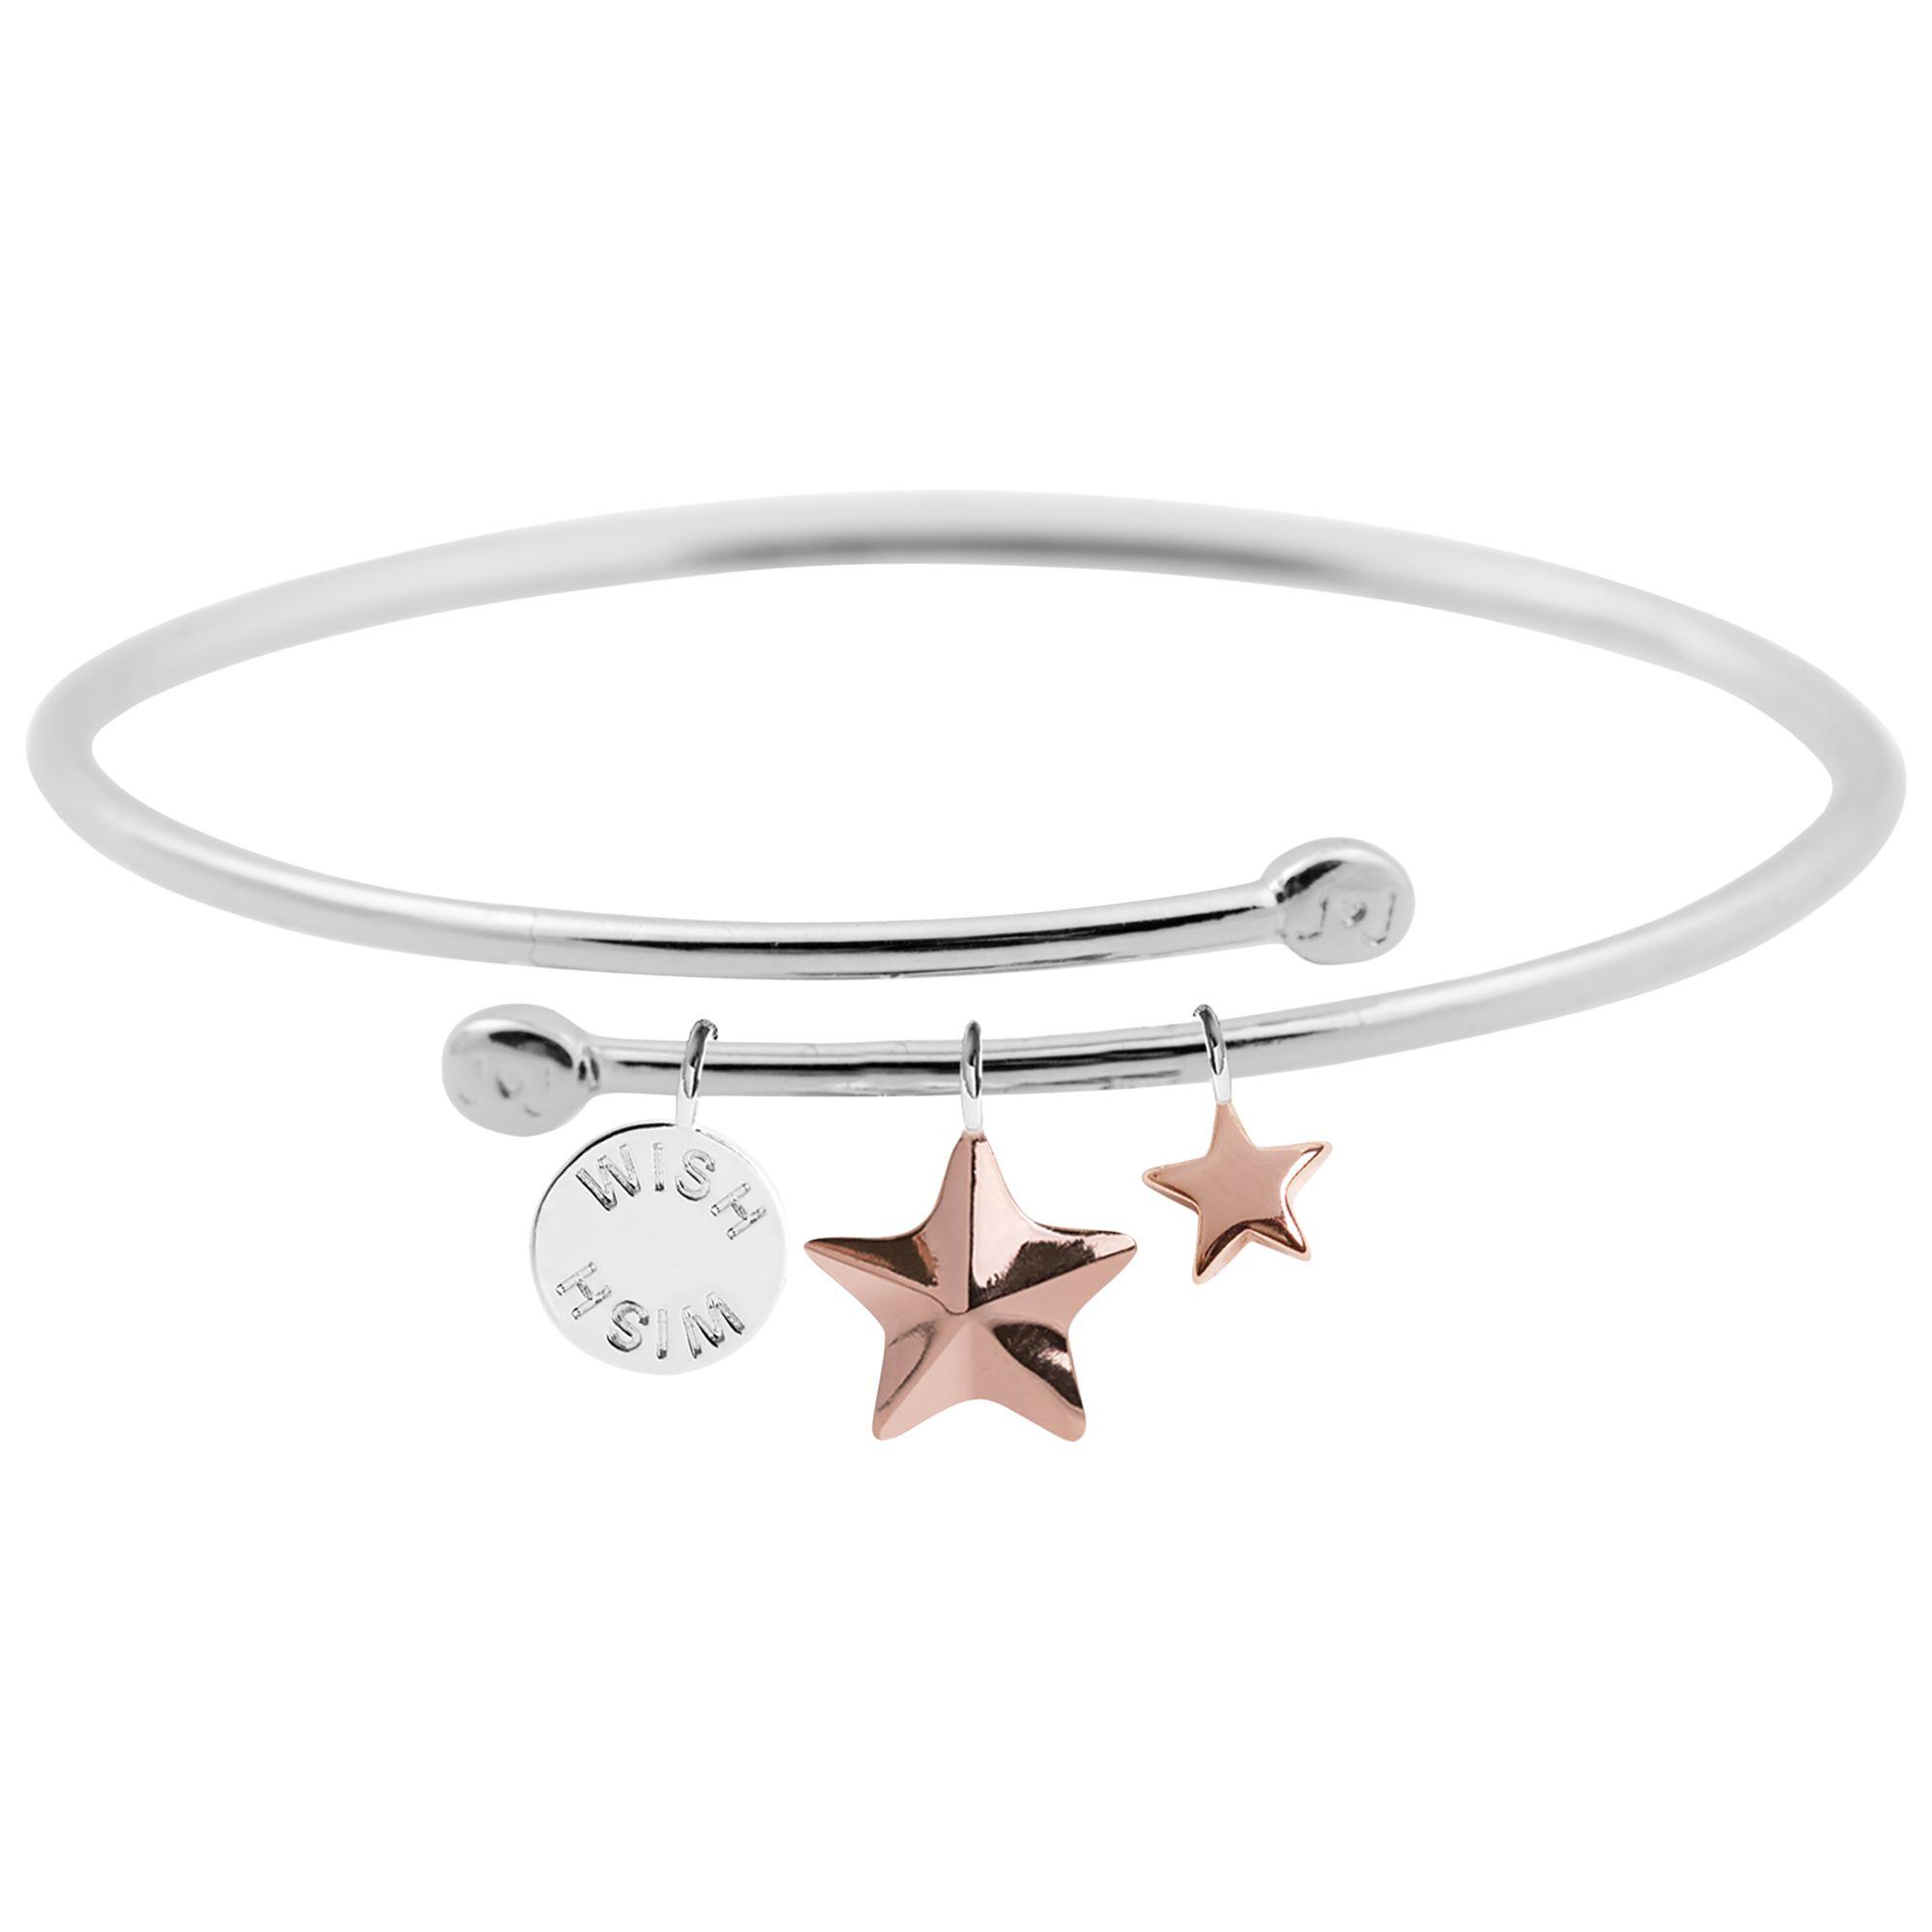 Joma Joma Wish Story Star Charm Bangle, Silver/Rose Gold